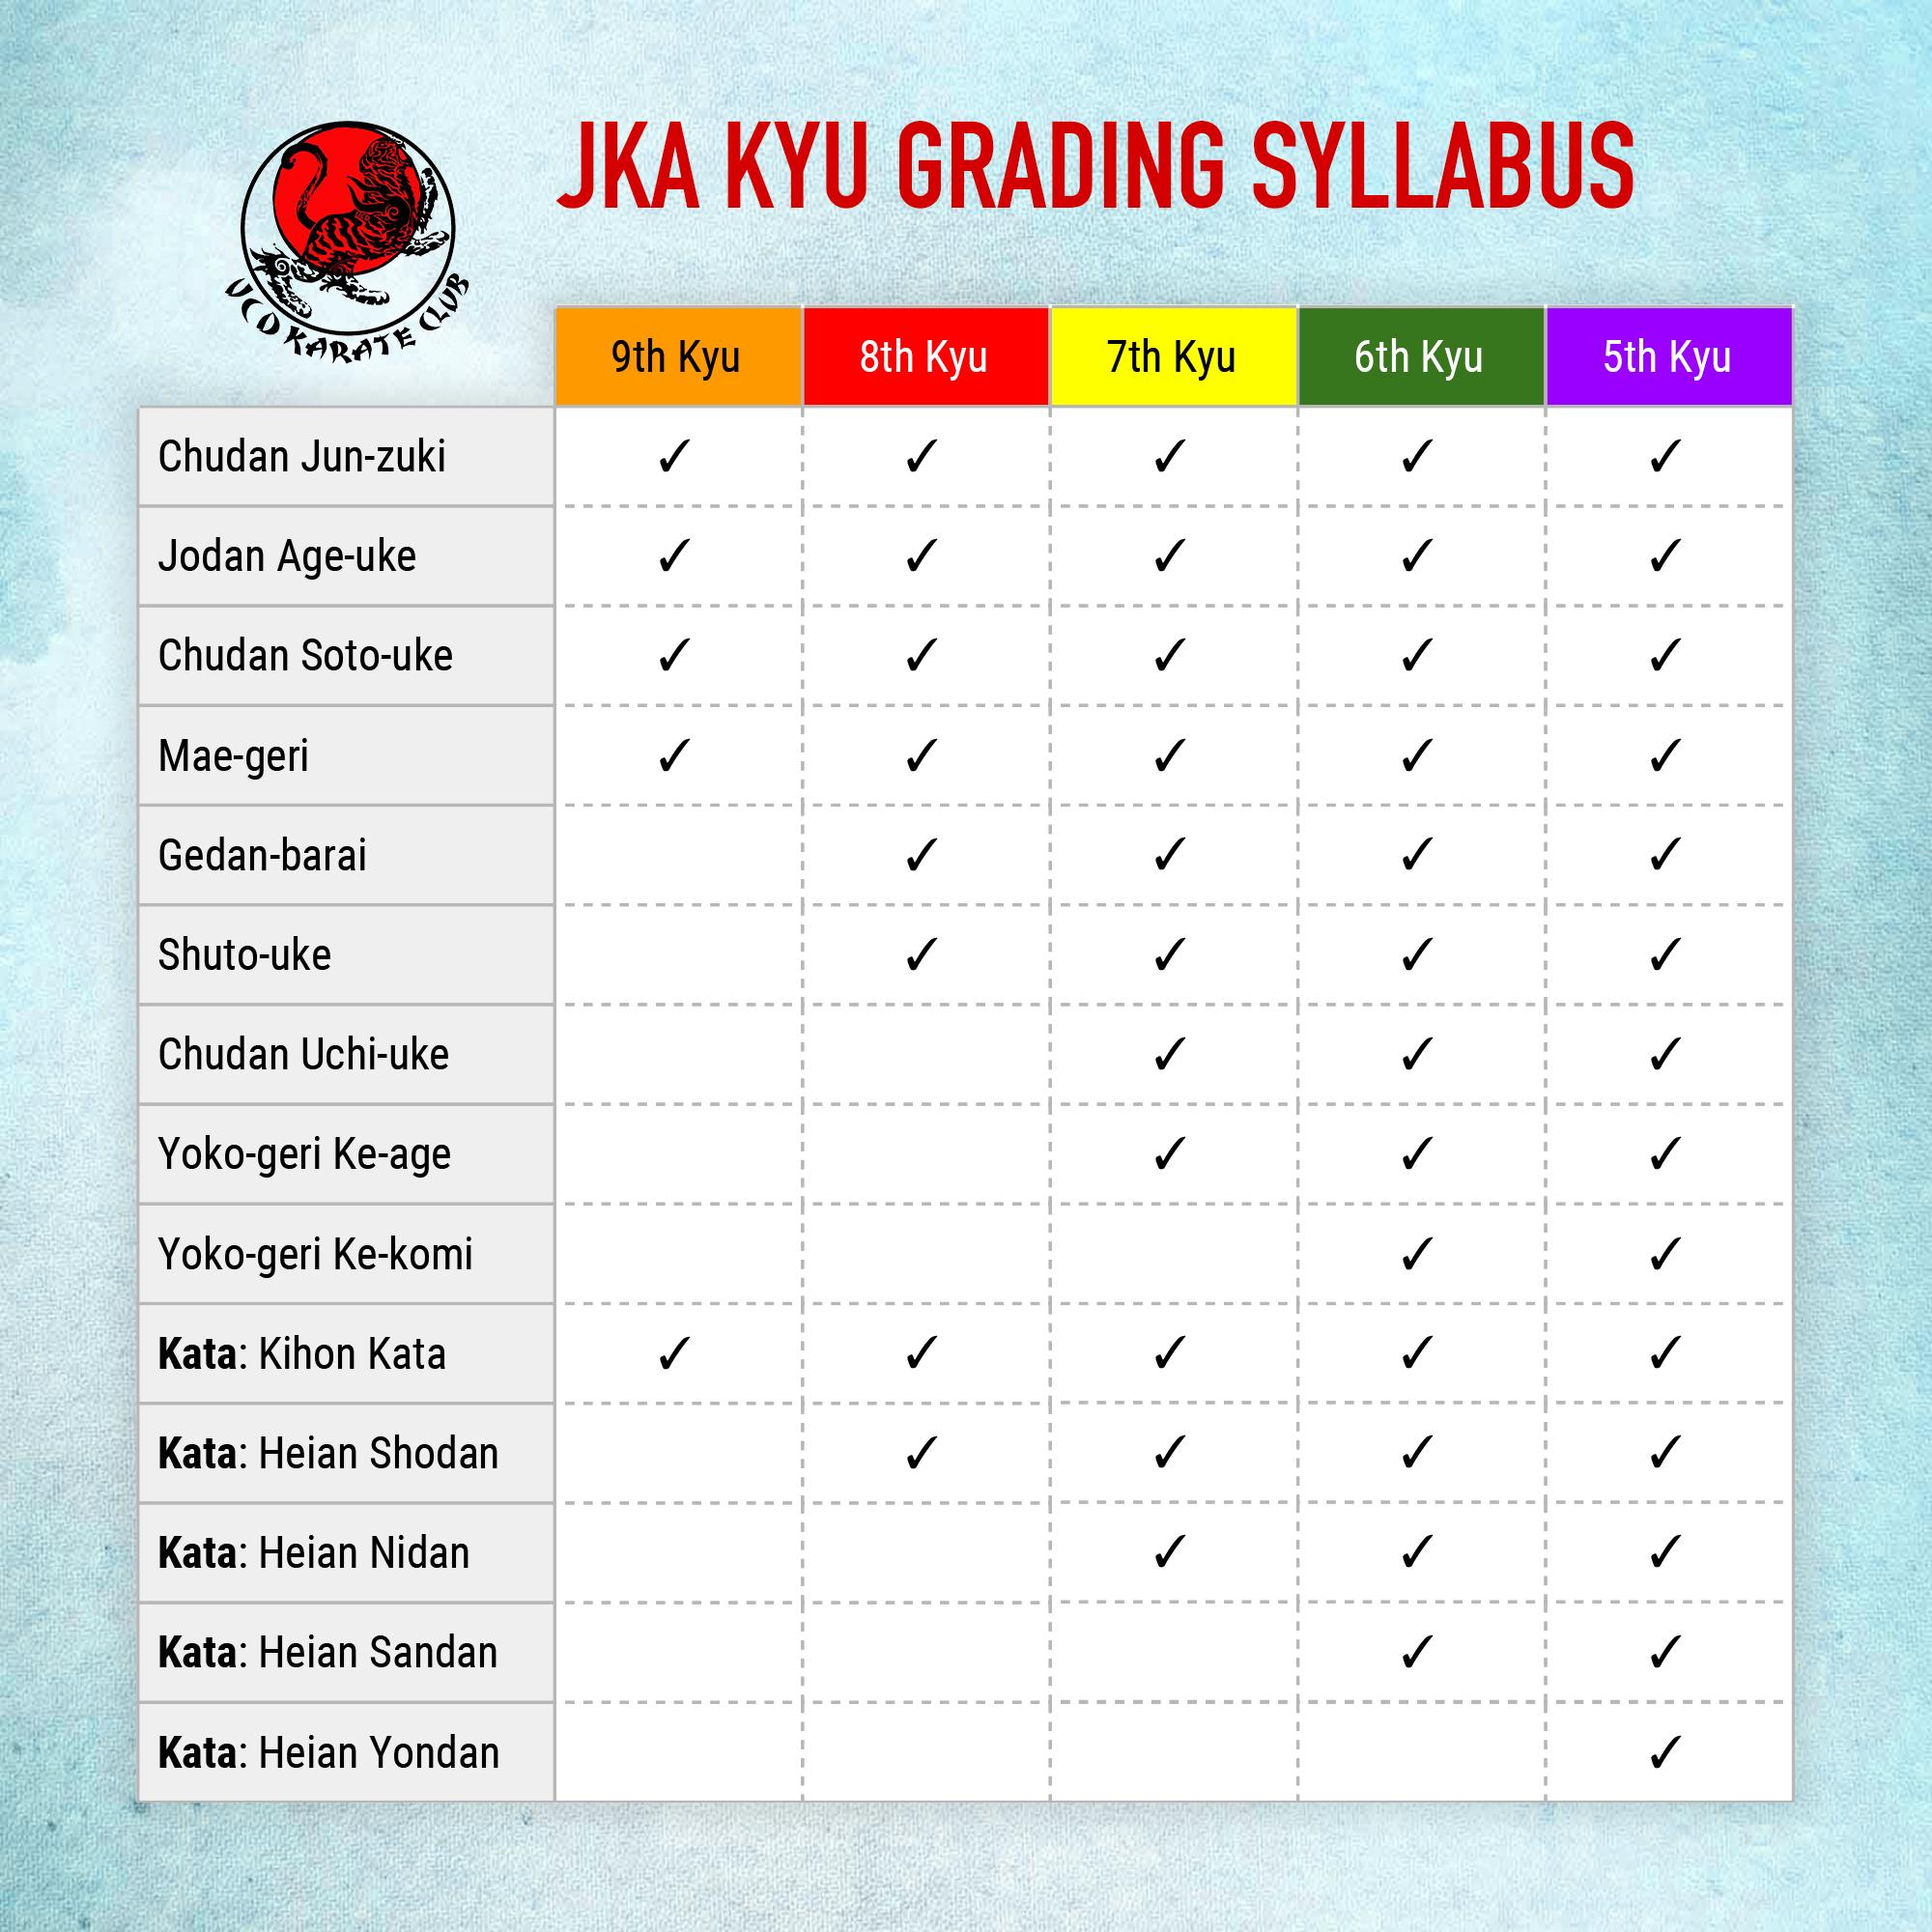 JKA Kyu Grading Syllabus